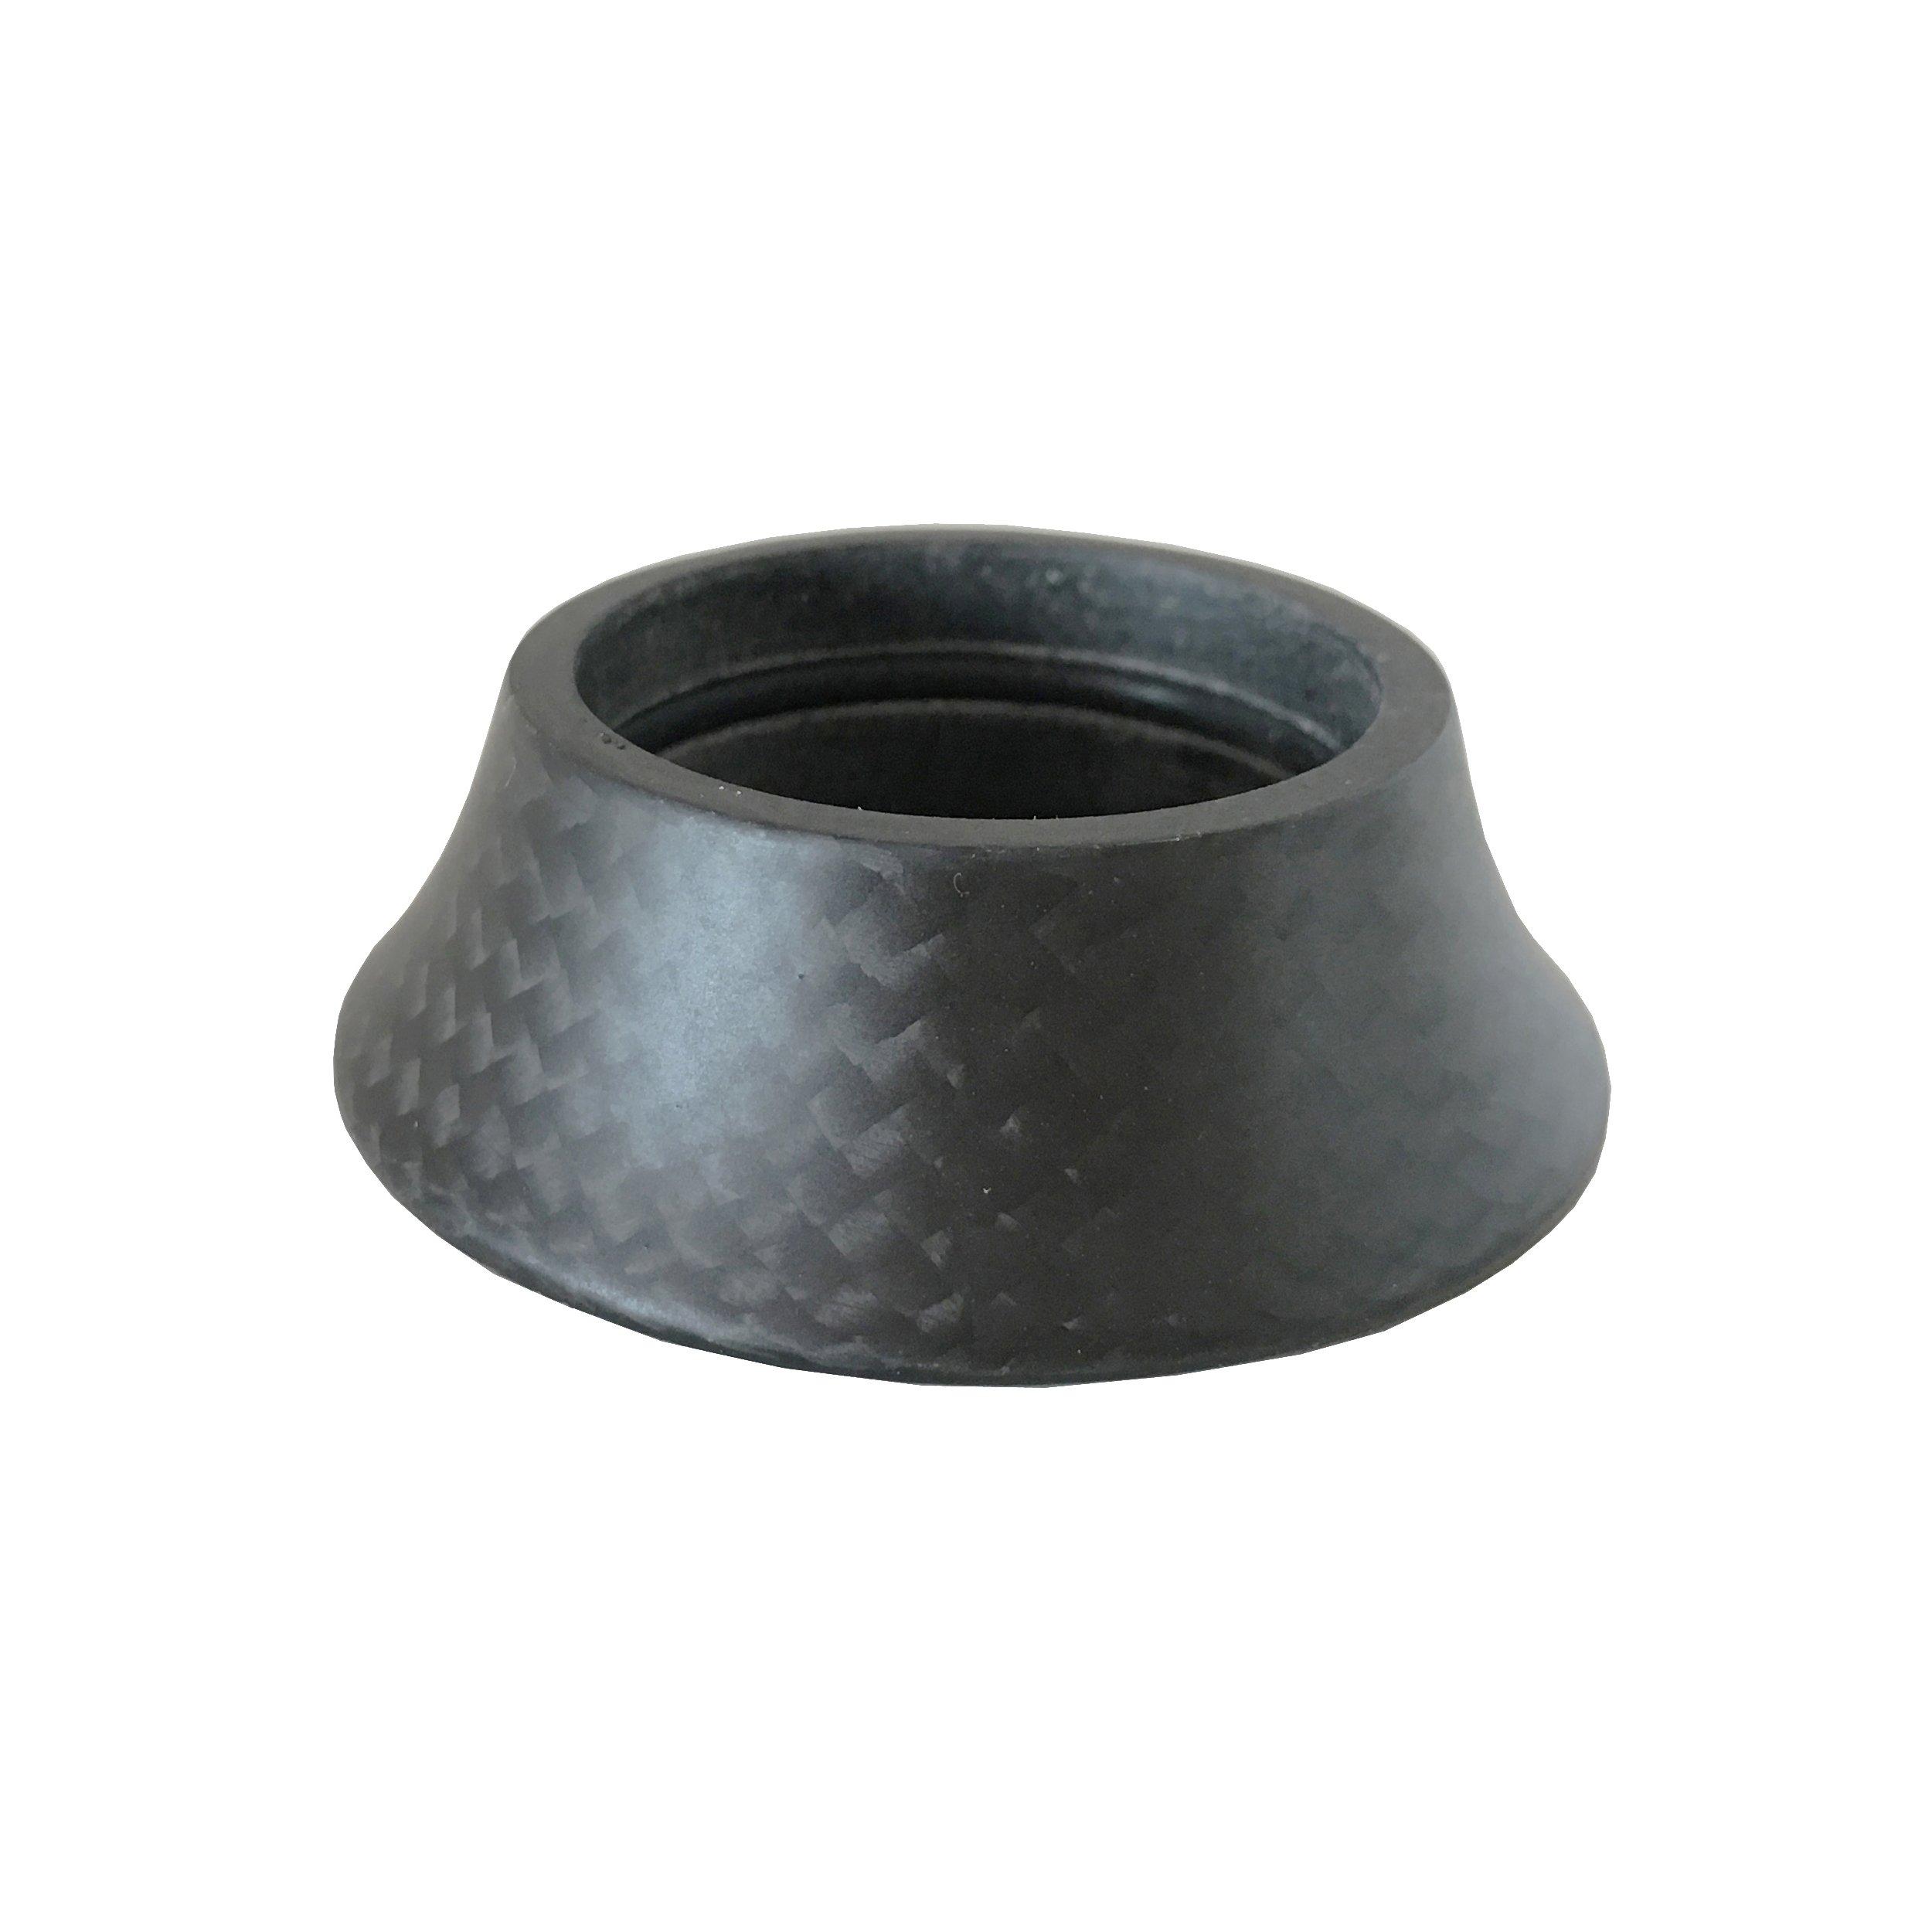 DEERU Bike Carbon Headset Washer (Matte) by DEERU